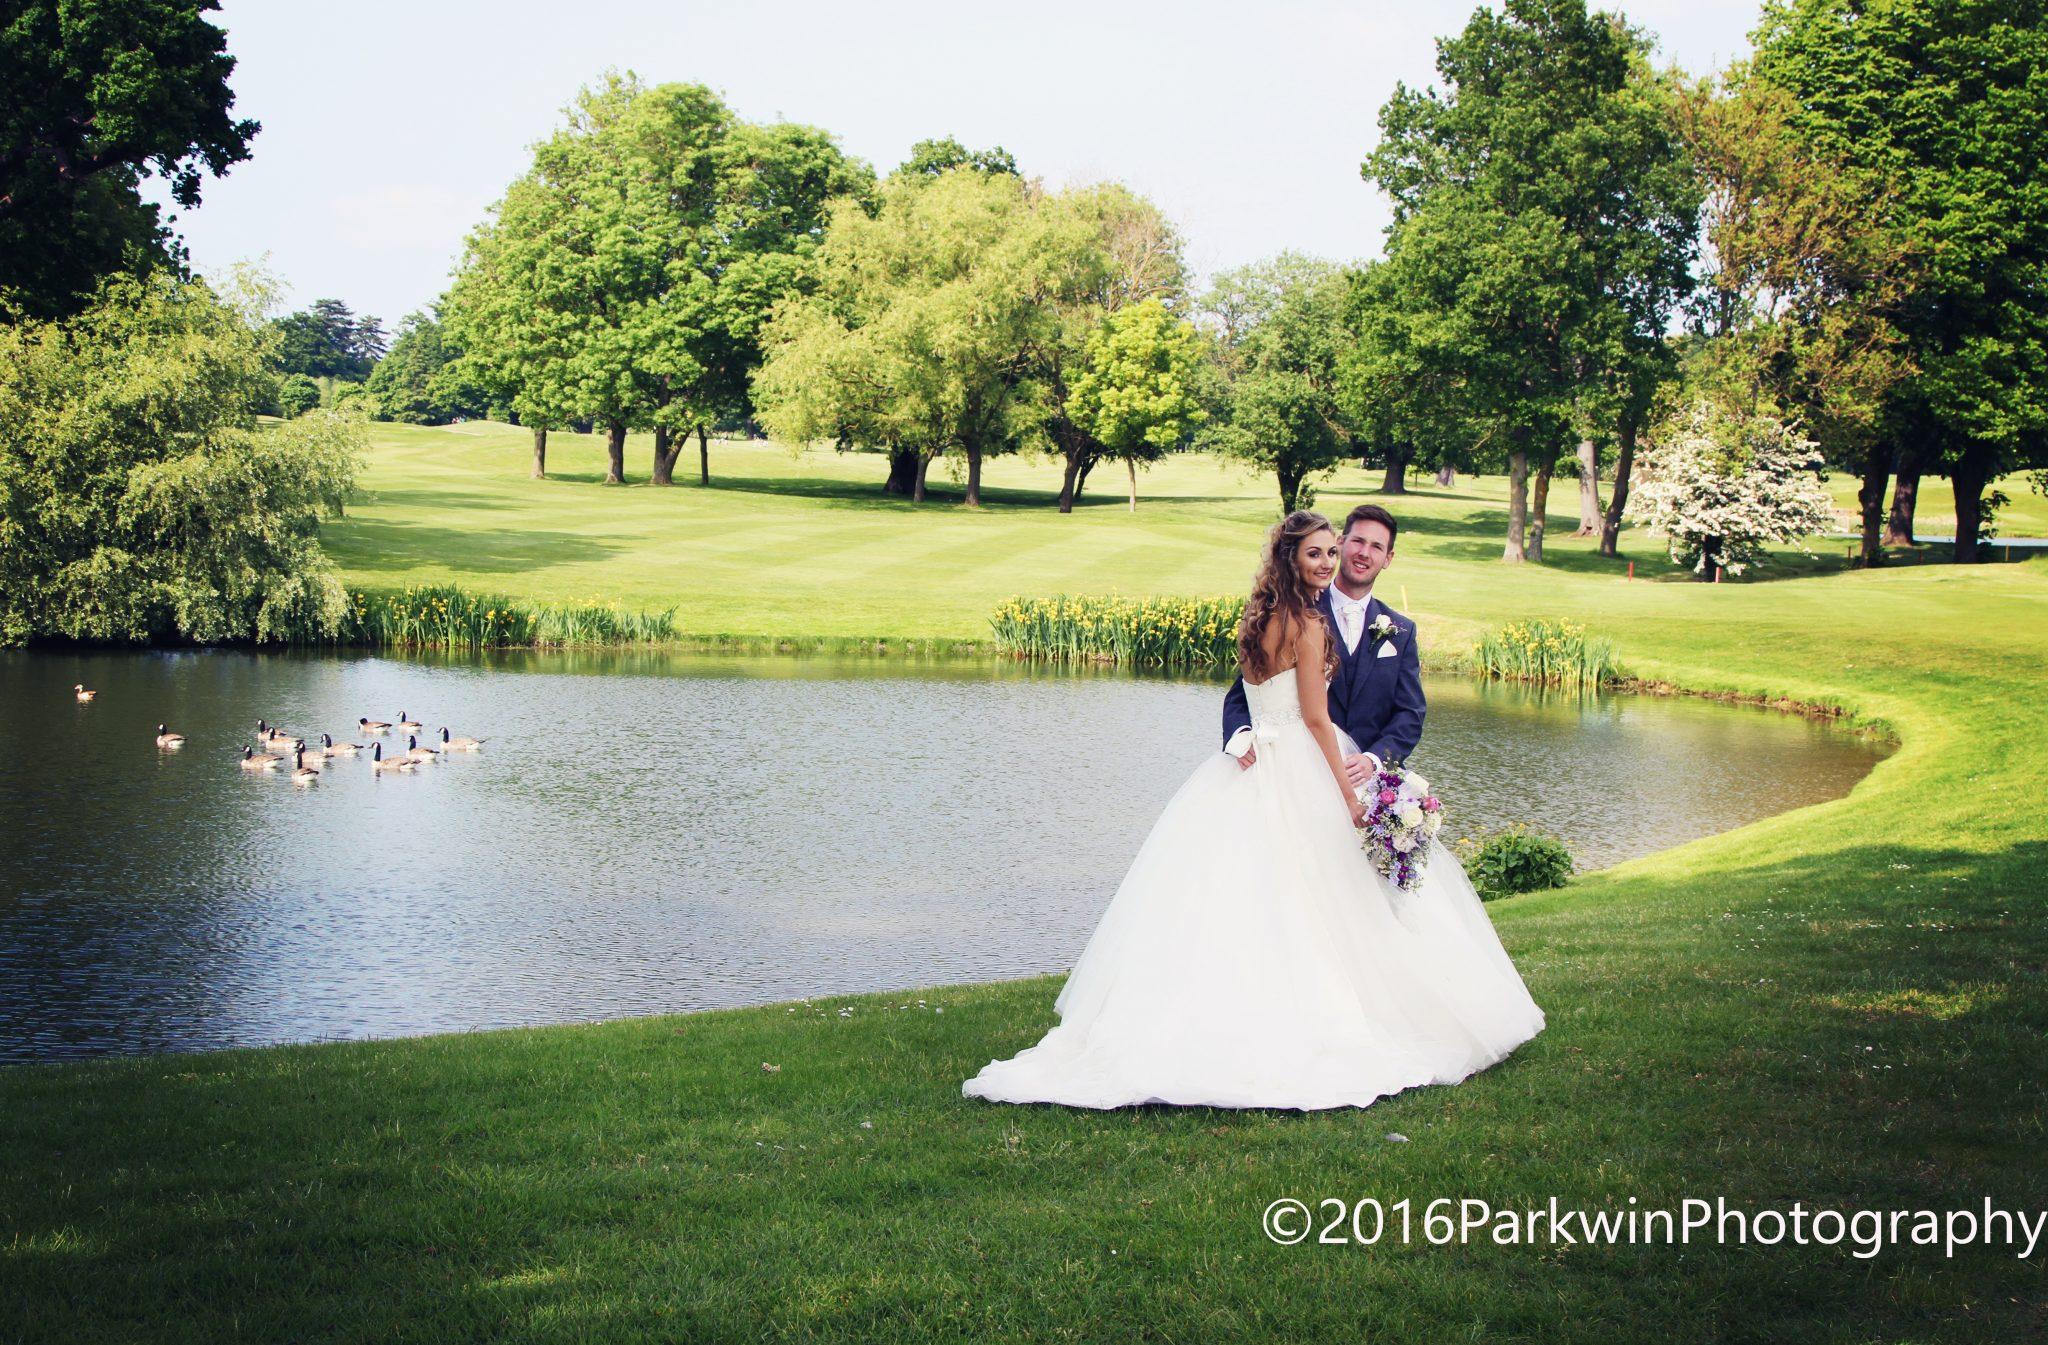 Wedding at Hanbury Manor